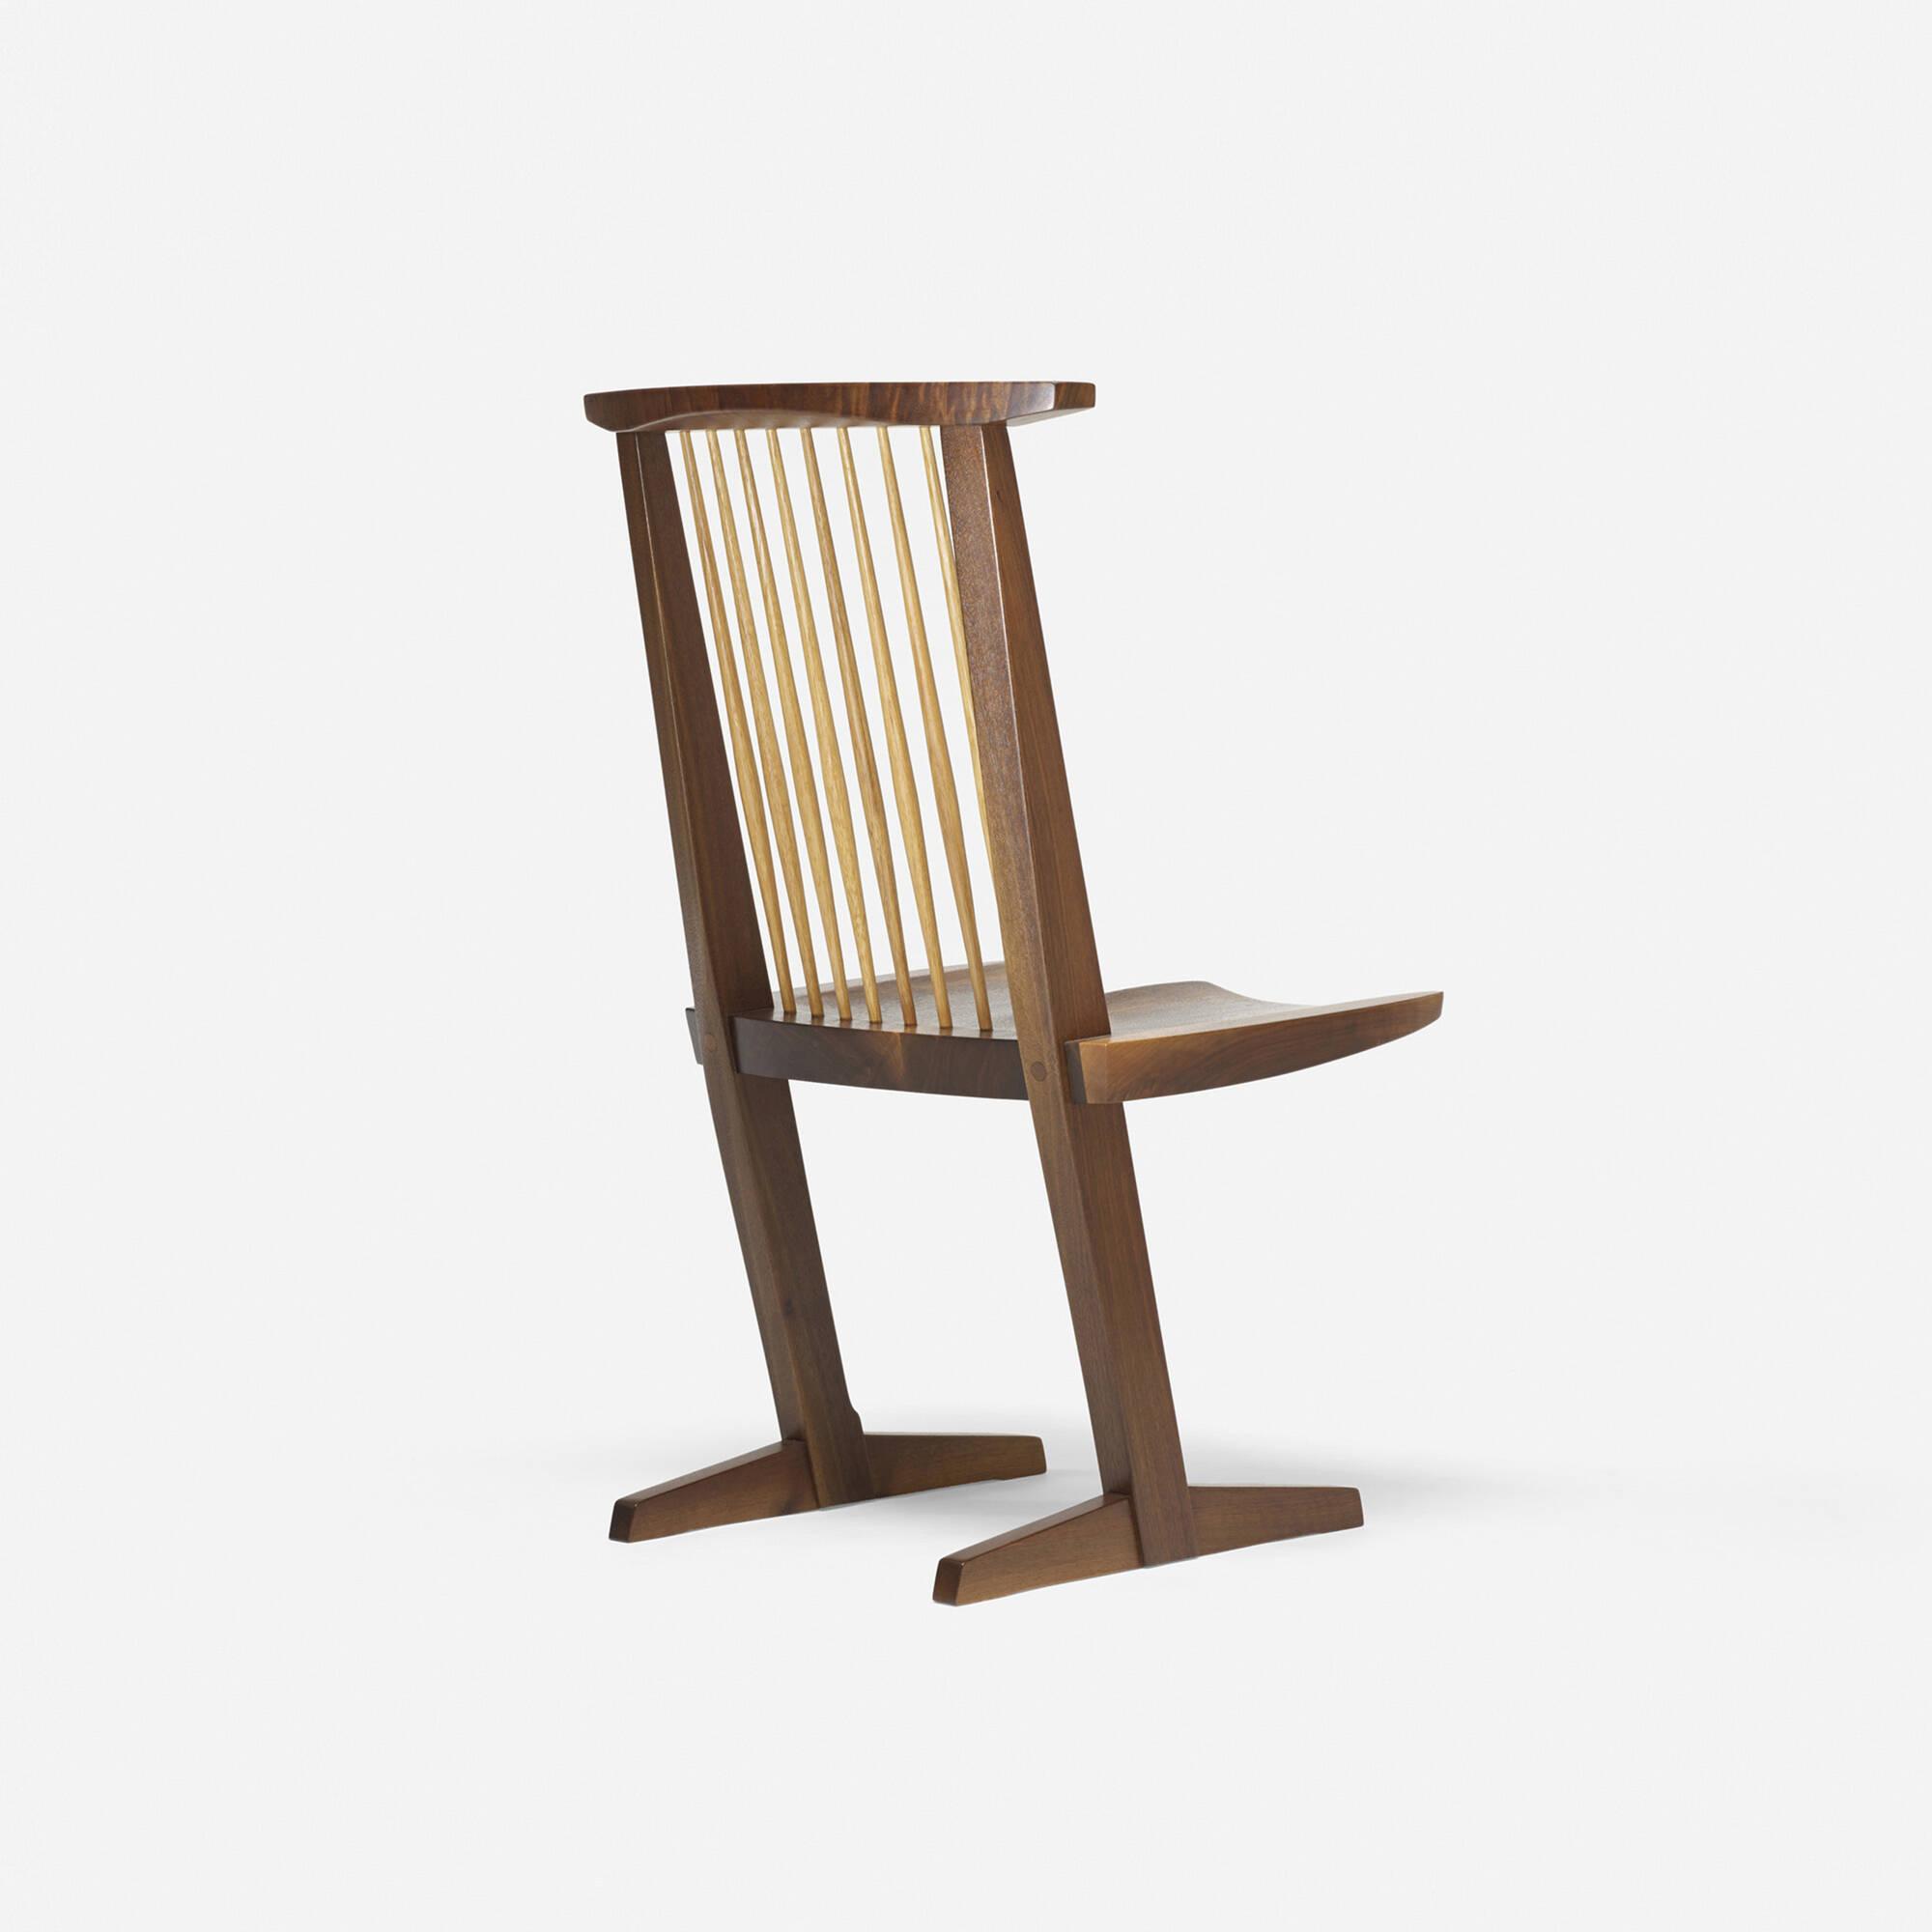 George Nakashima Chairs 145: george nakashima / conoid chair < design, 17 october 2013